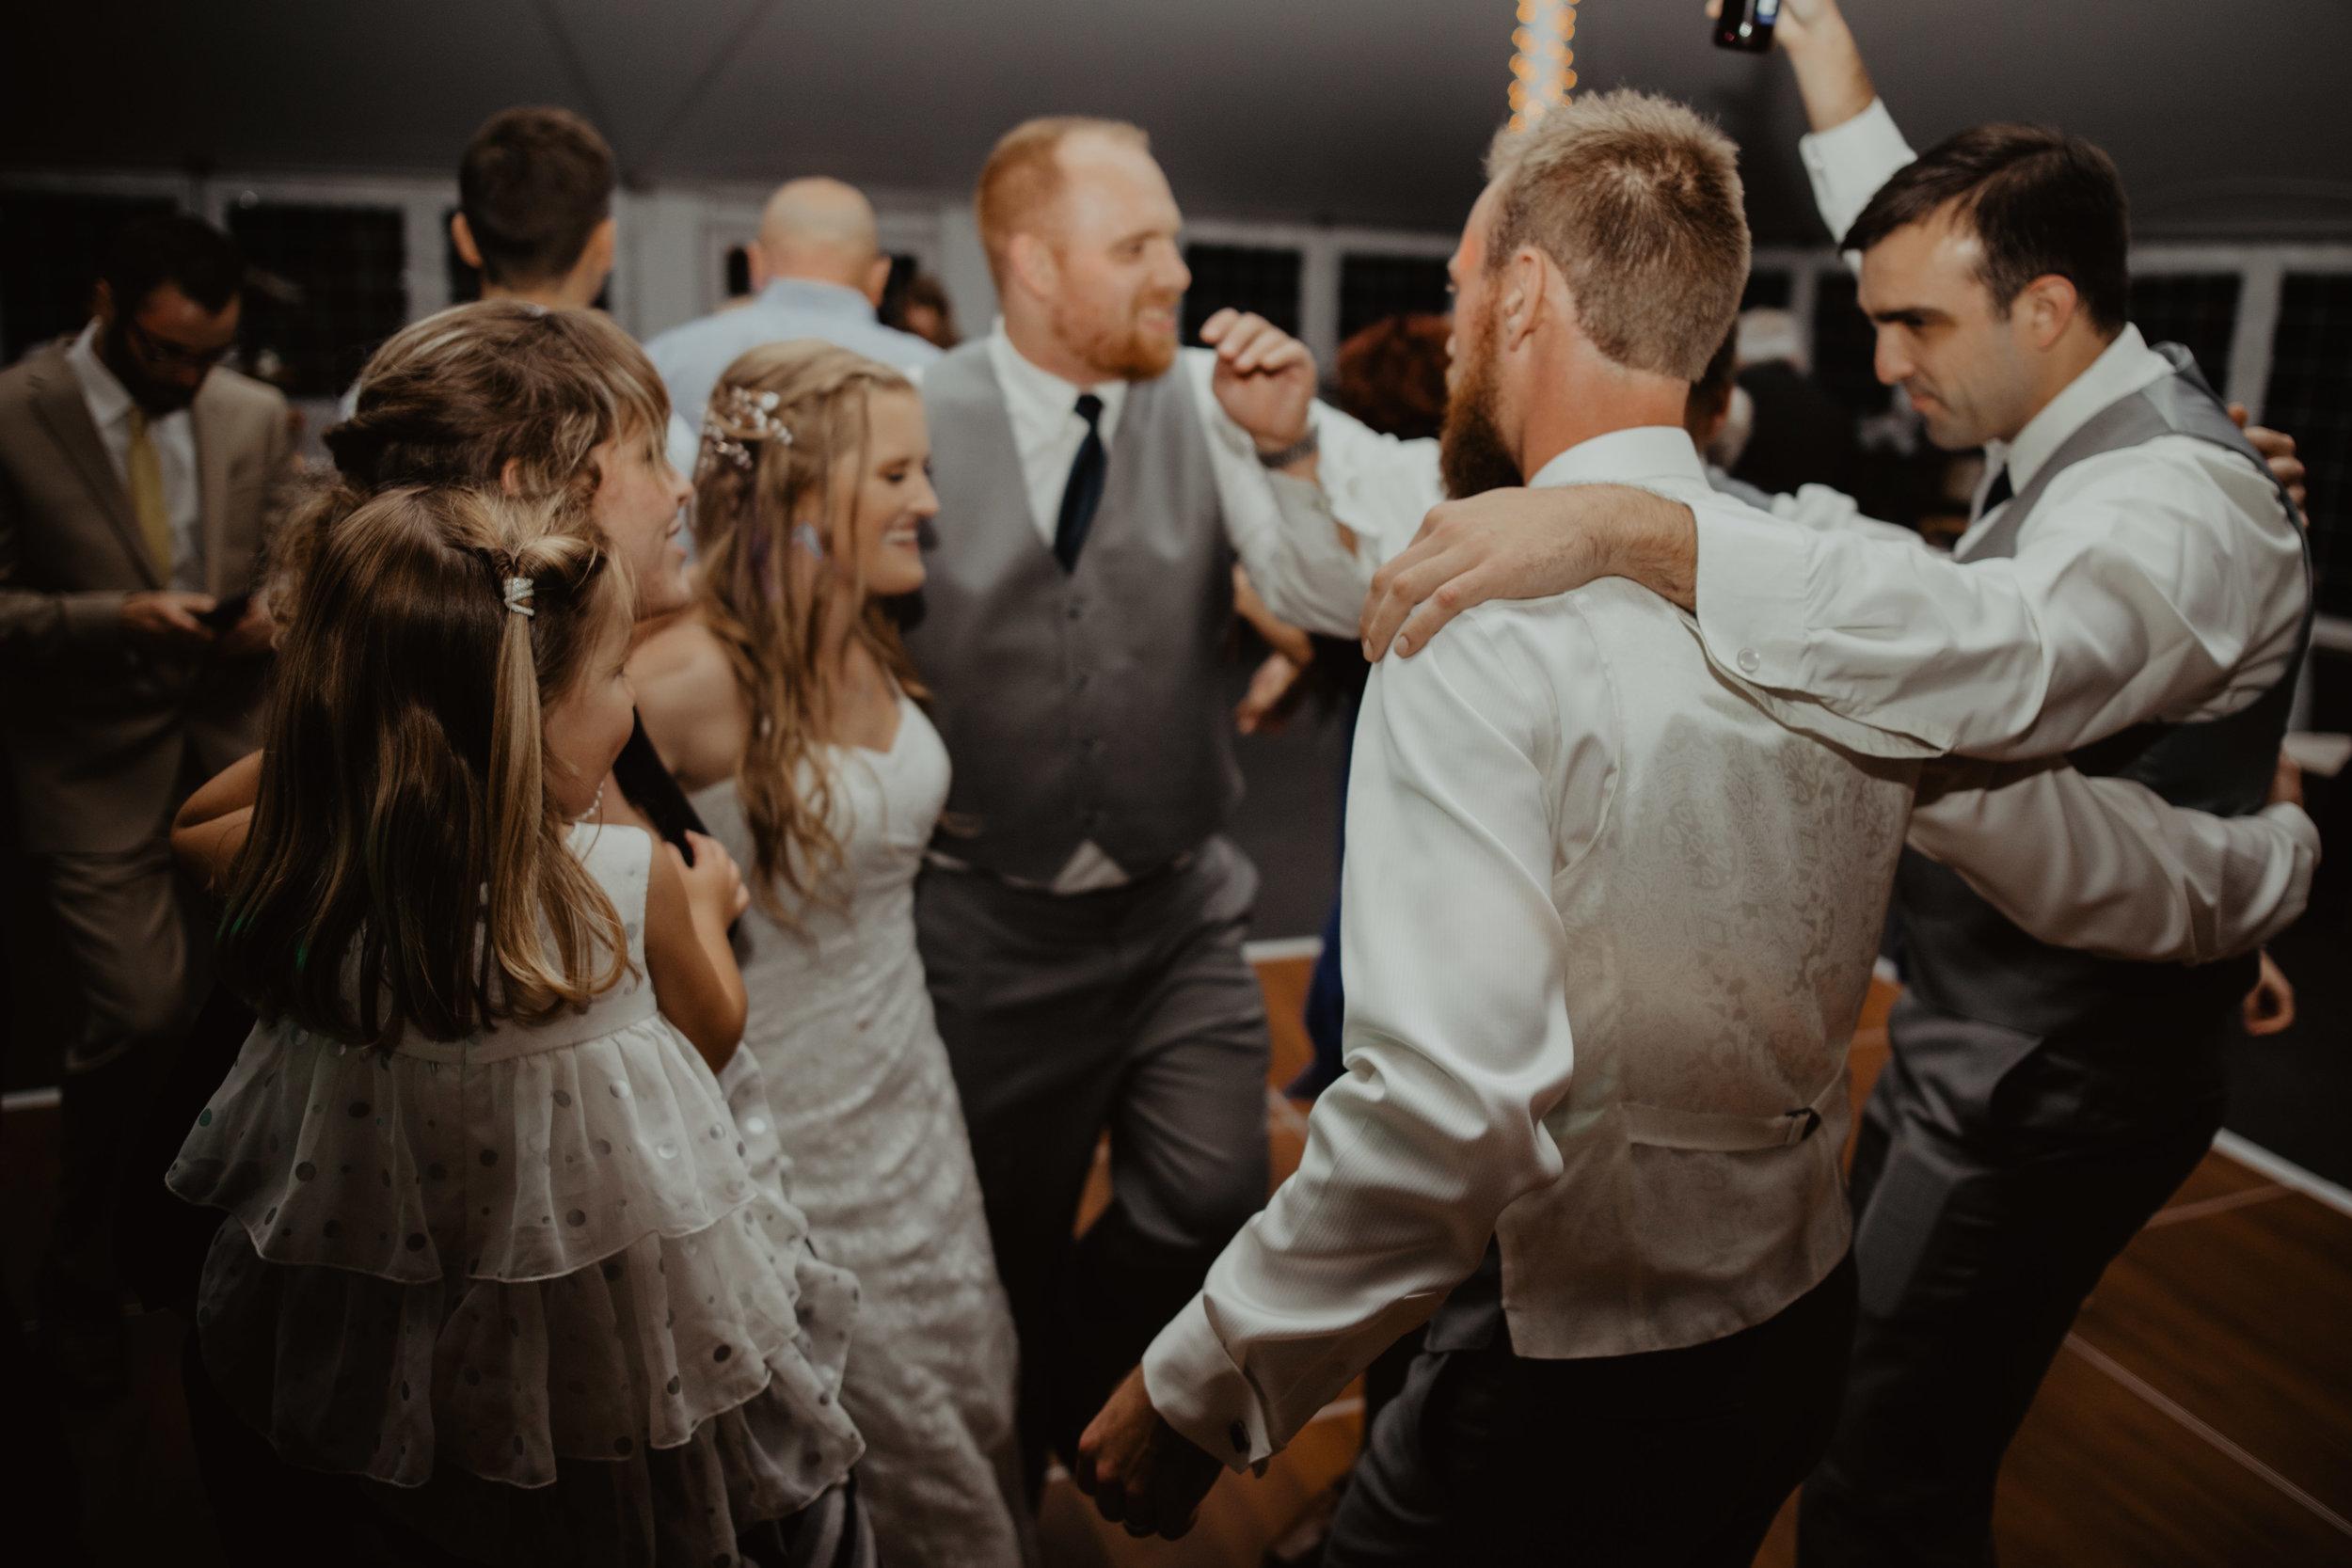 Vermont Wedding | Lorianna Weathers Photography-2616.jpg